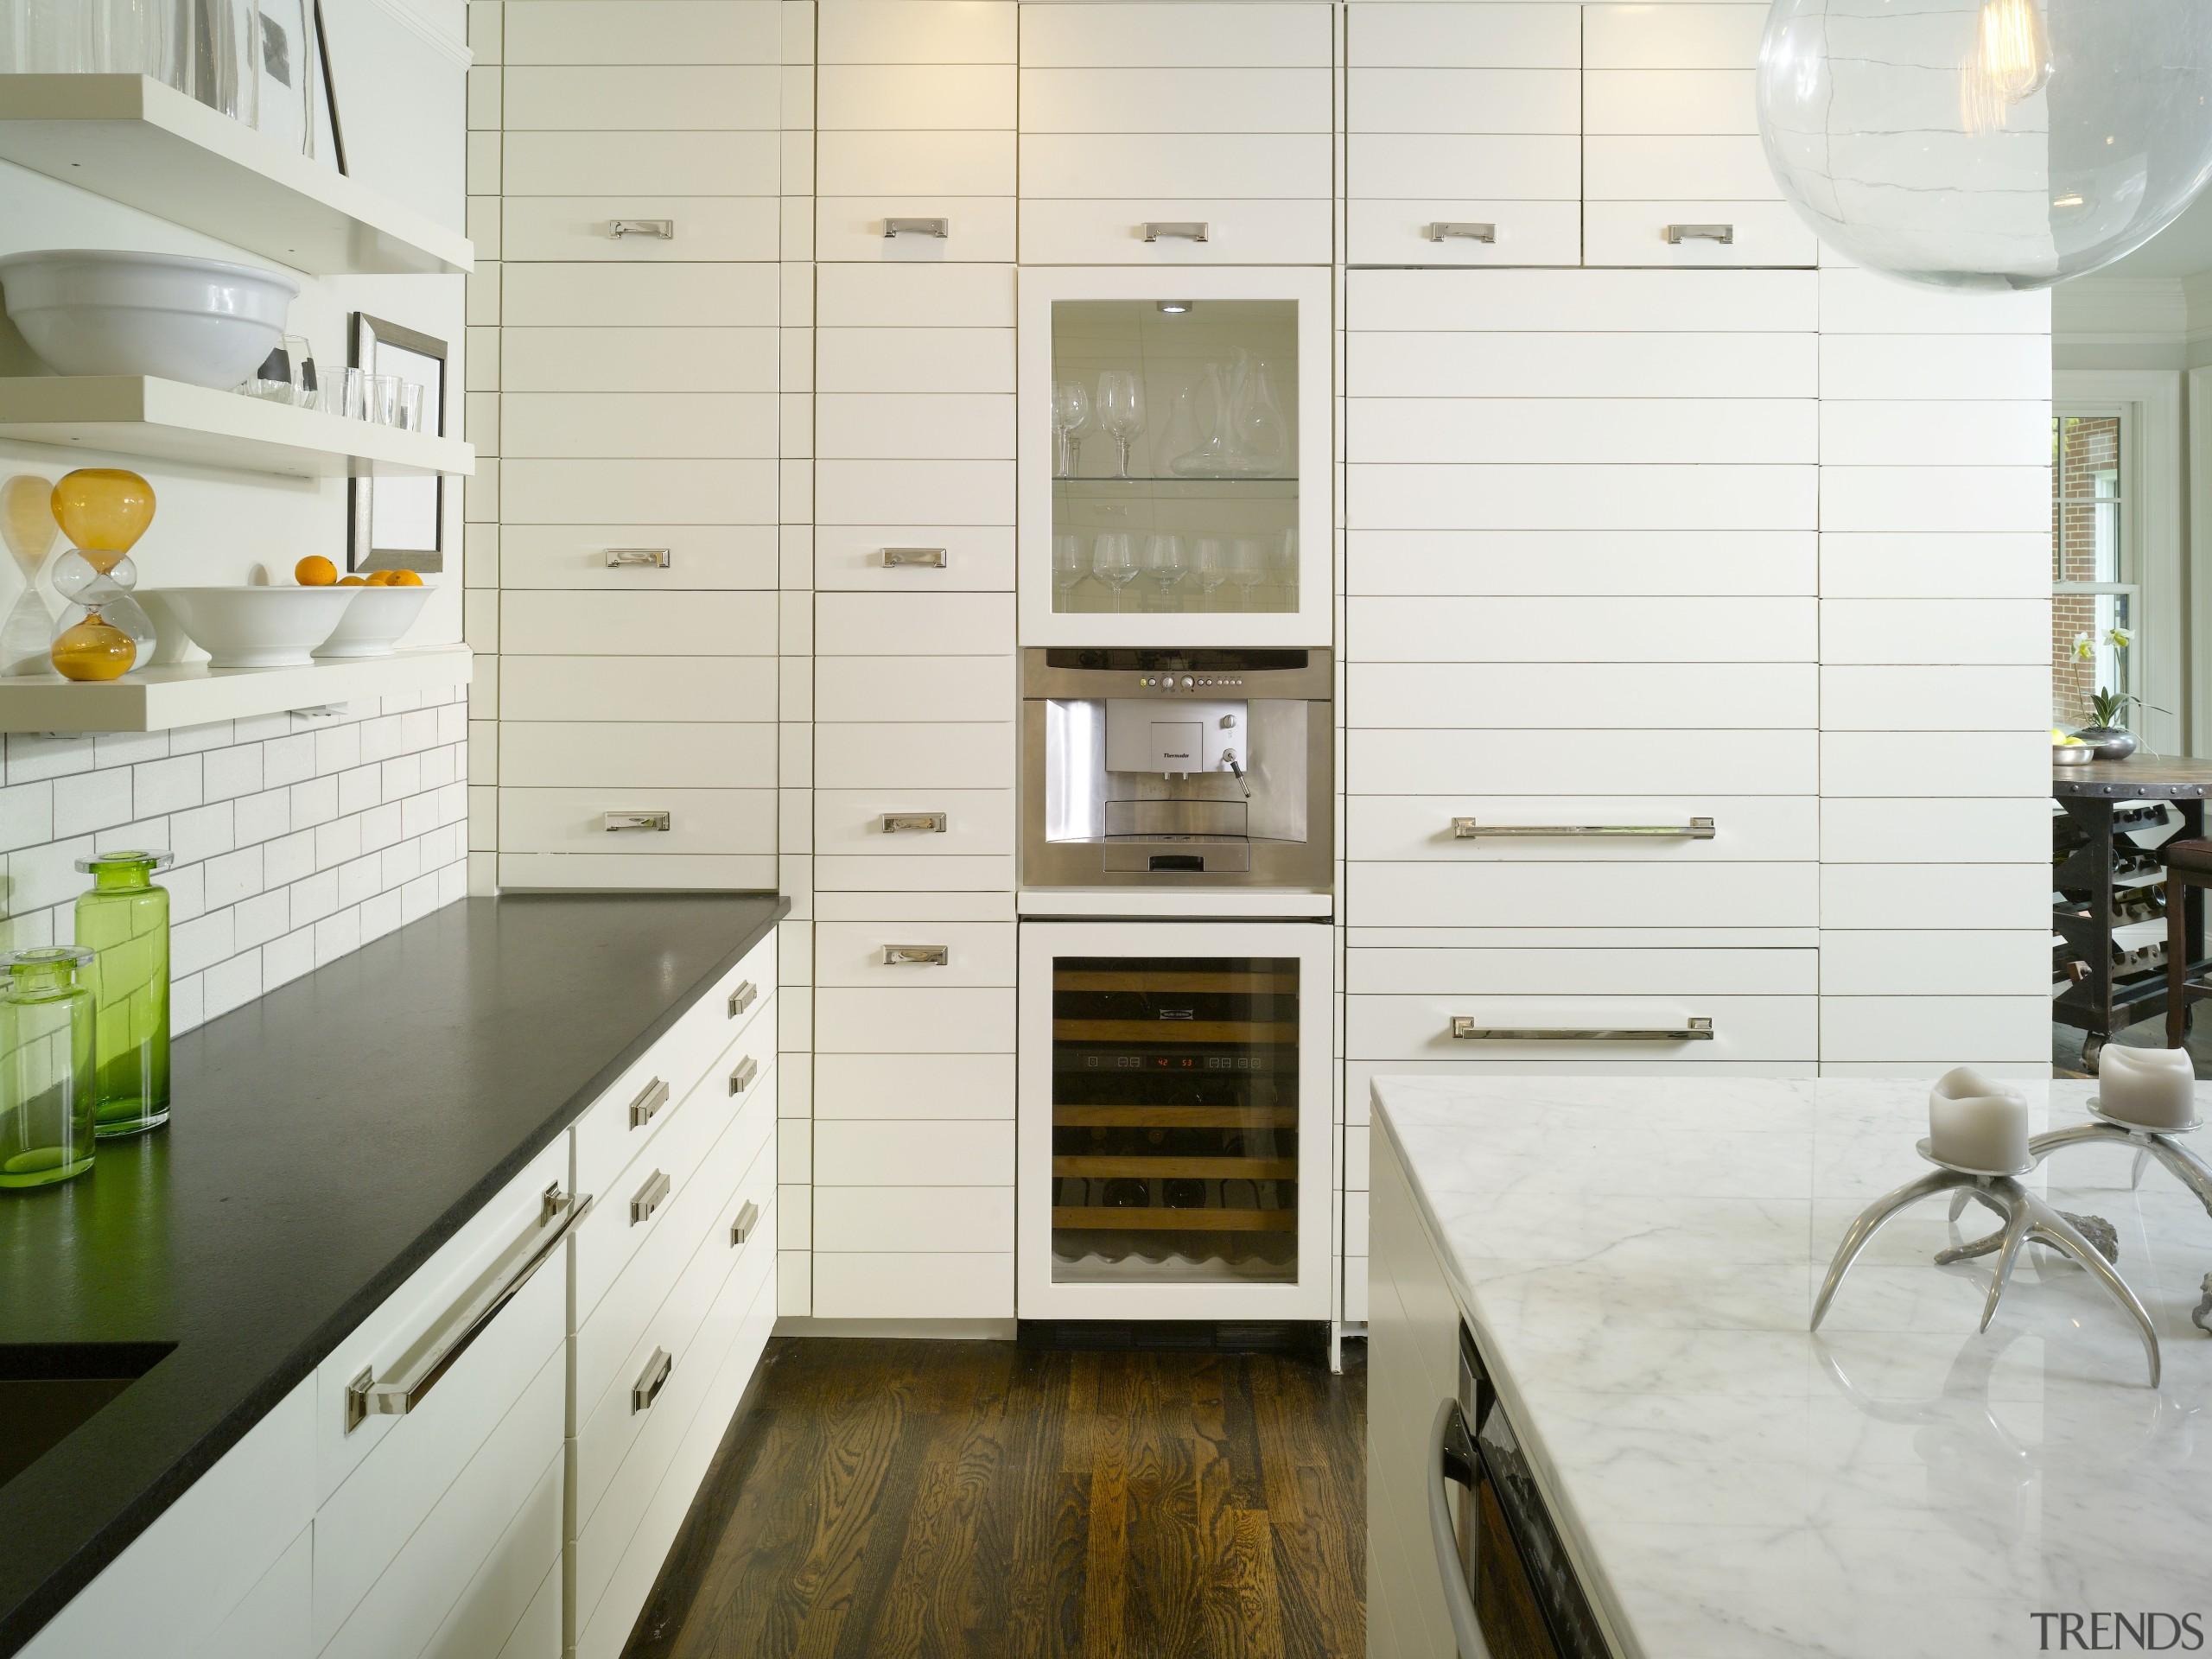 View of kitchen by Designer Willis Watts. Remodelled cabinetry, countertop, cuisine classique, floor, flooring, interior design, kitchen, room, white